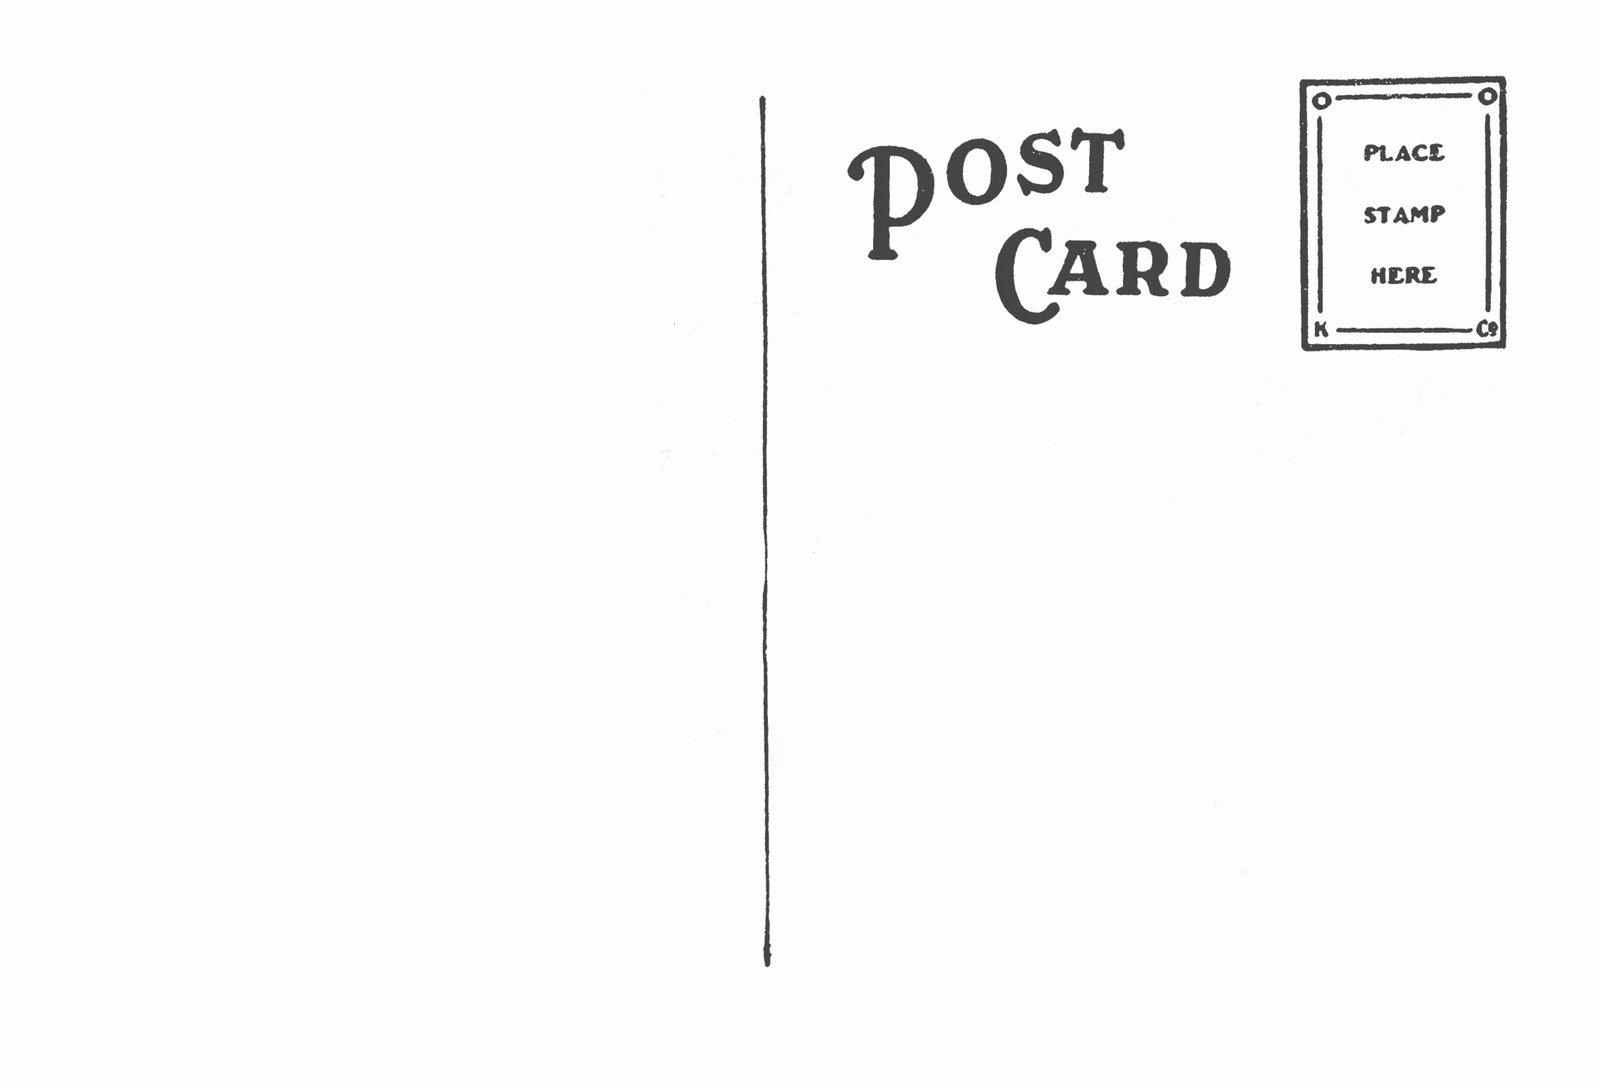 Propnomicon Arkham Historical society Postcard